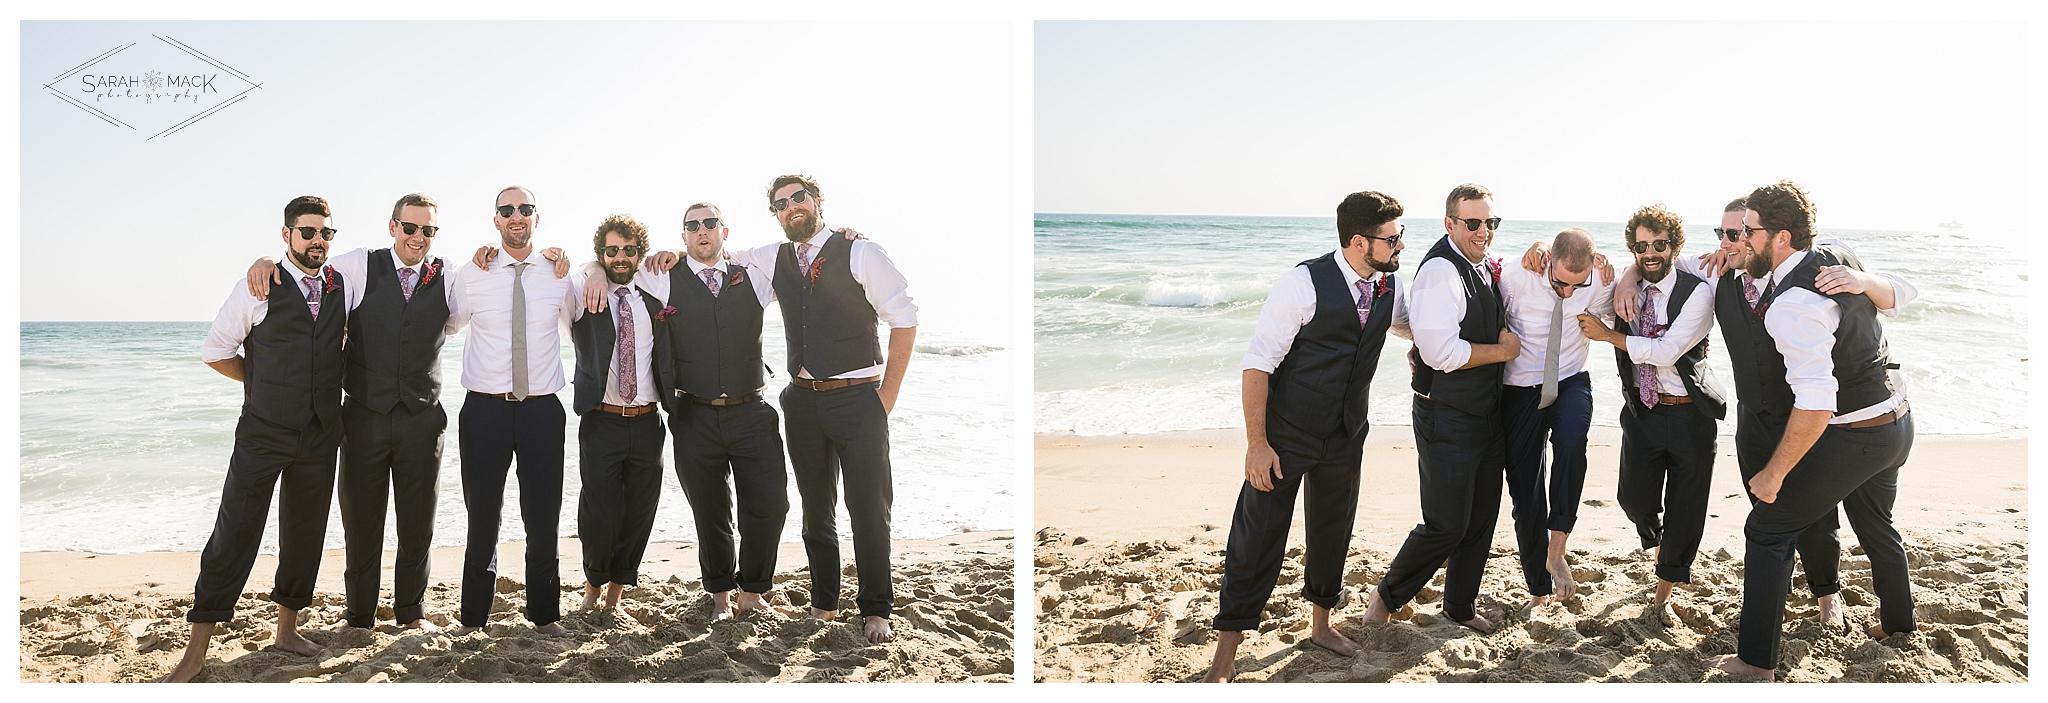 MR-Sea-Cliffe-Country-Club-Huntington-Beach-Wedding-0108.jpg